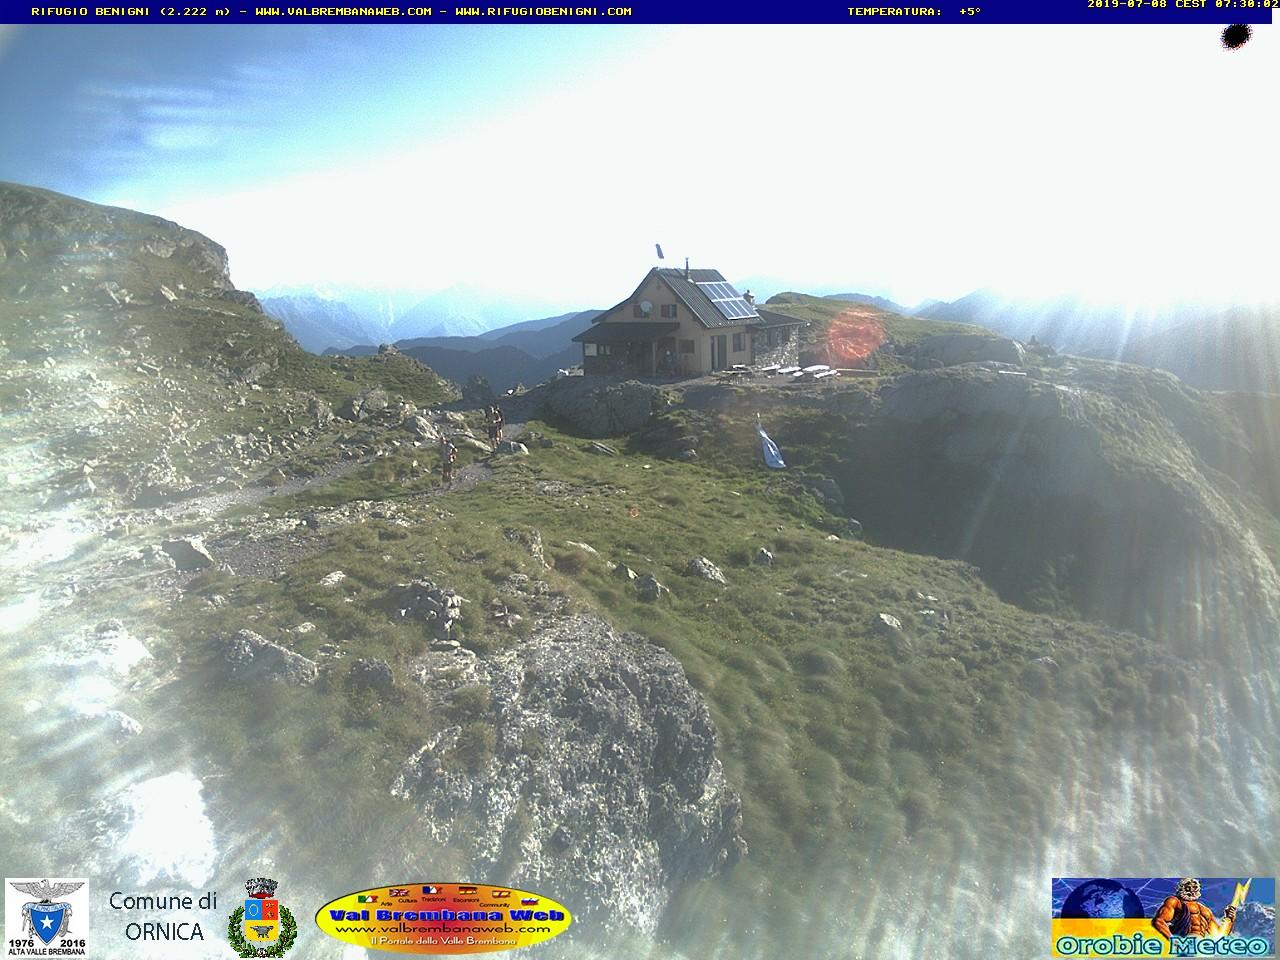 https://www.provinciabergamasca.com/webcam/Benigni2.jpg